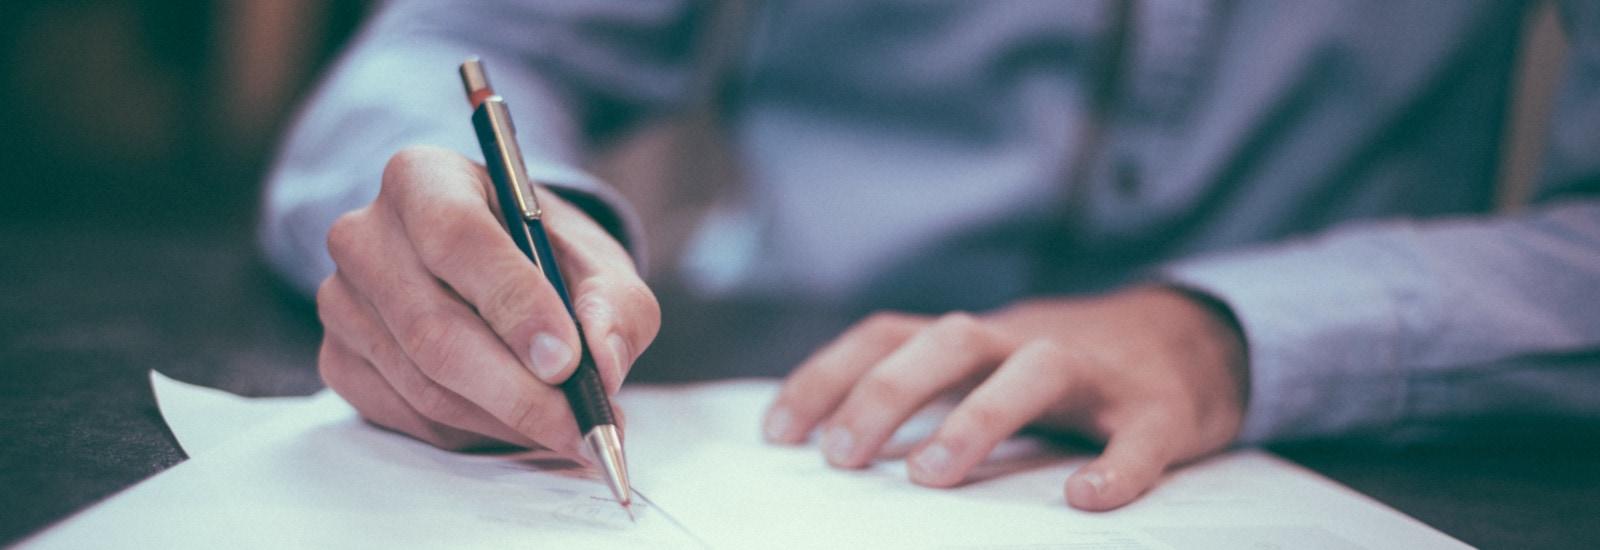 handtekening-zetten-jpeg